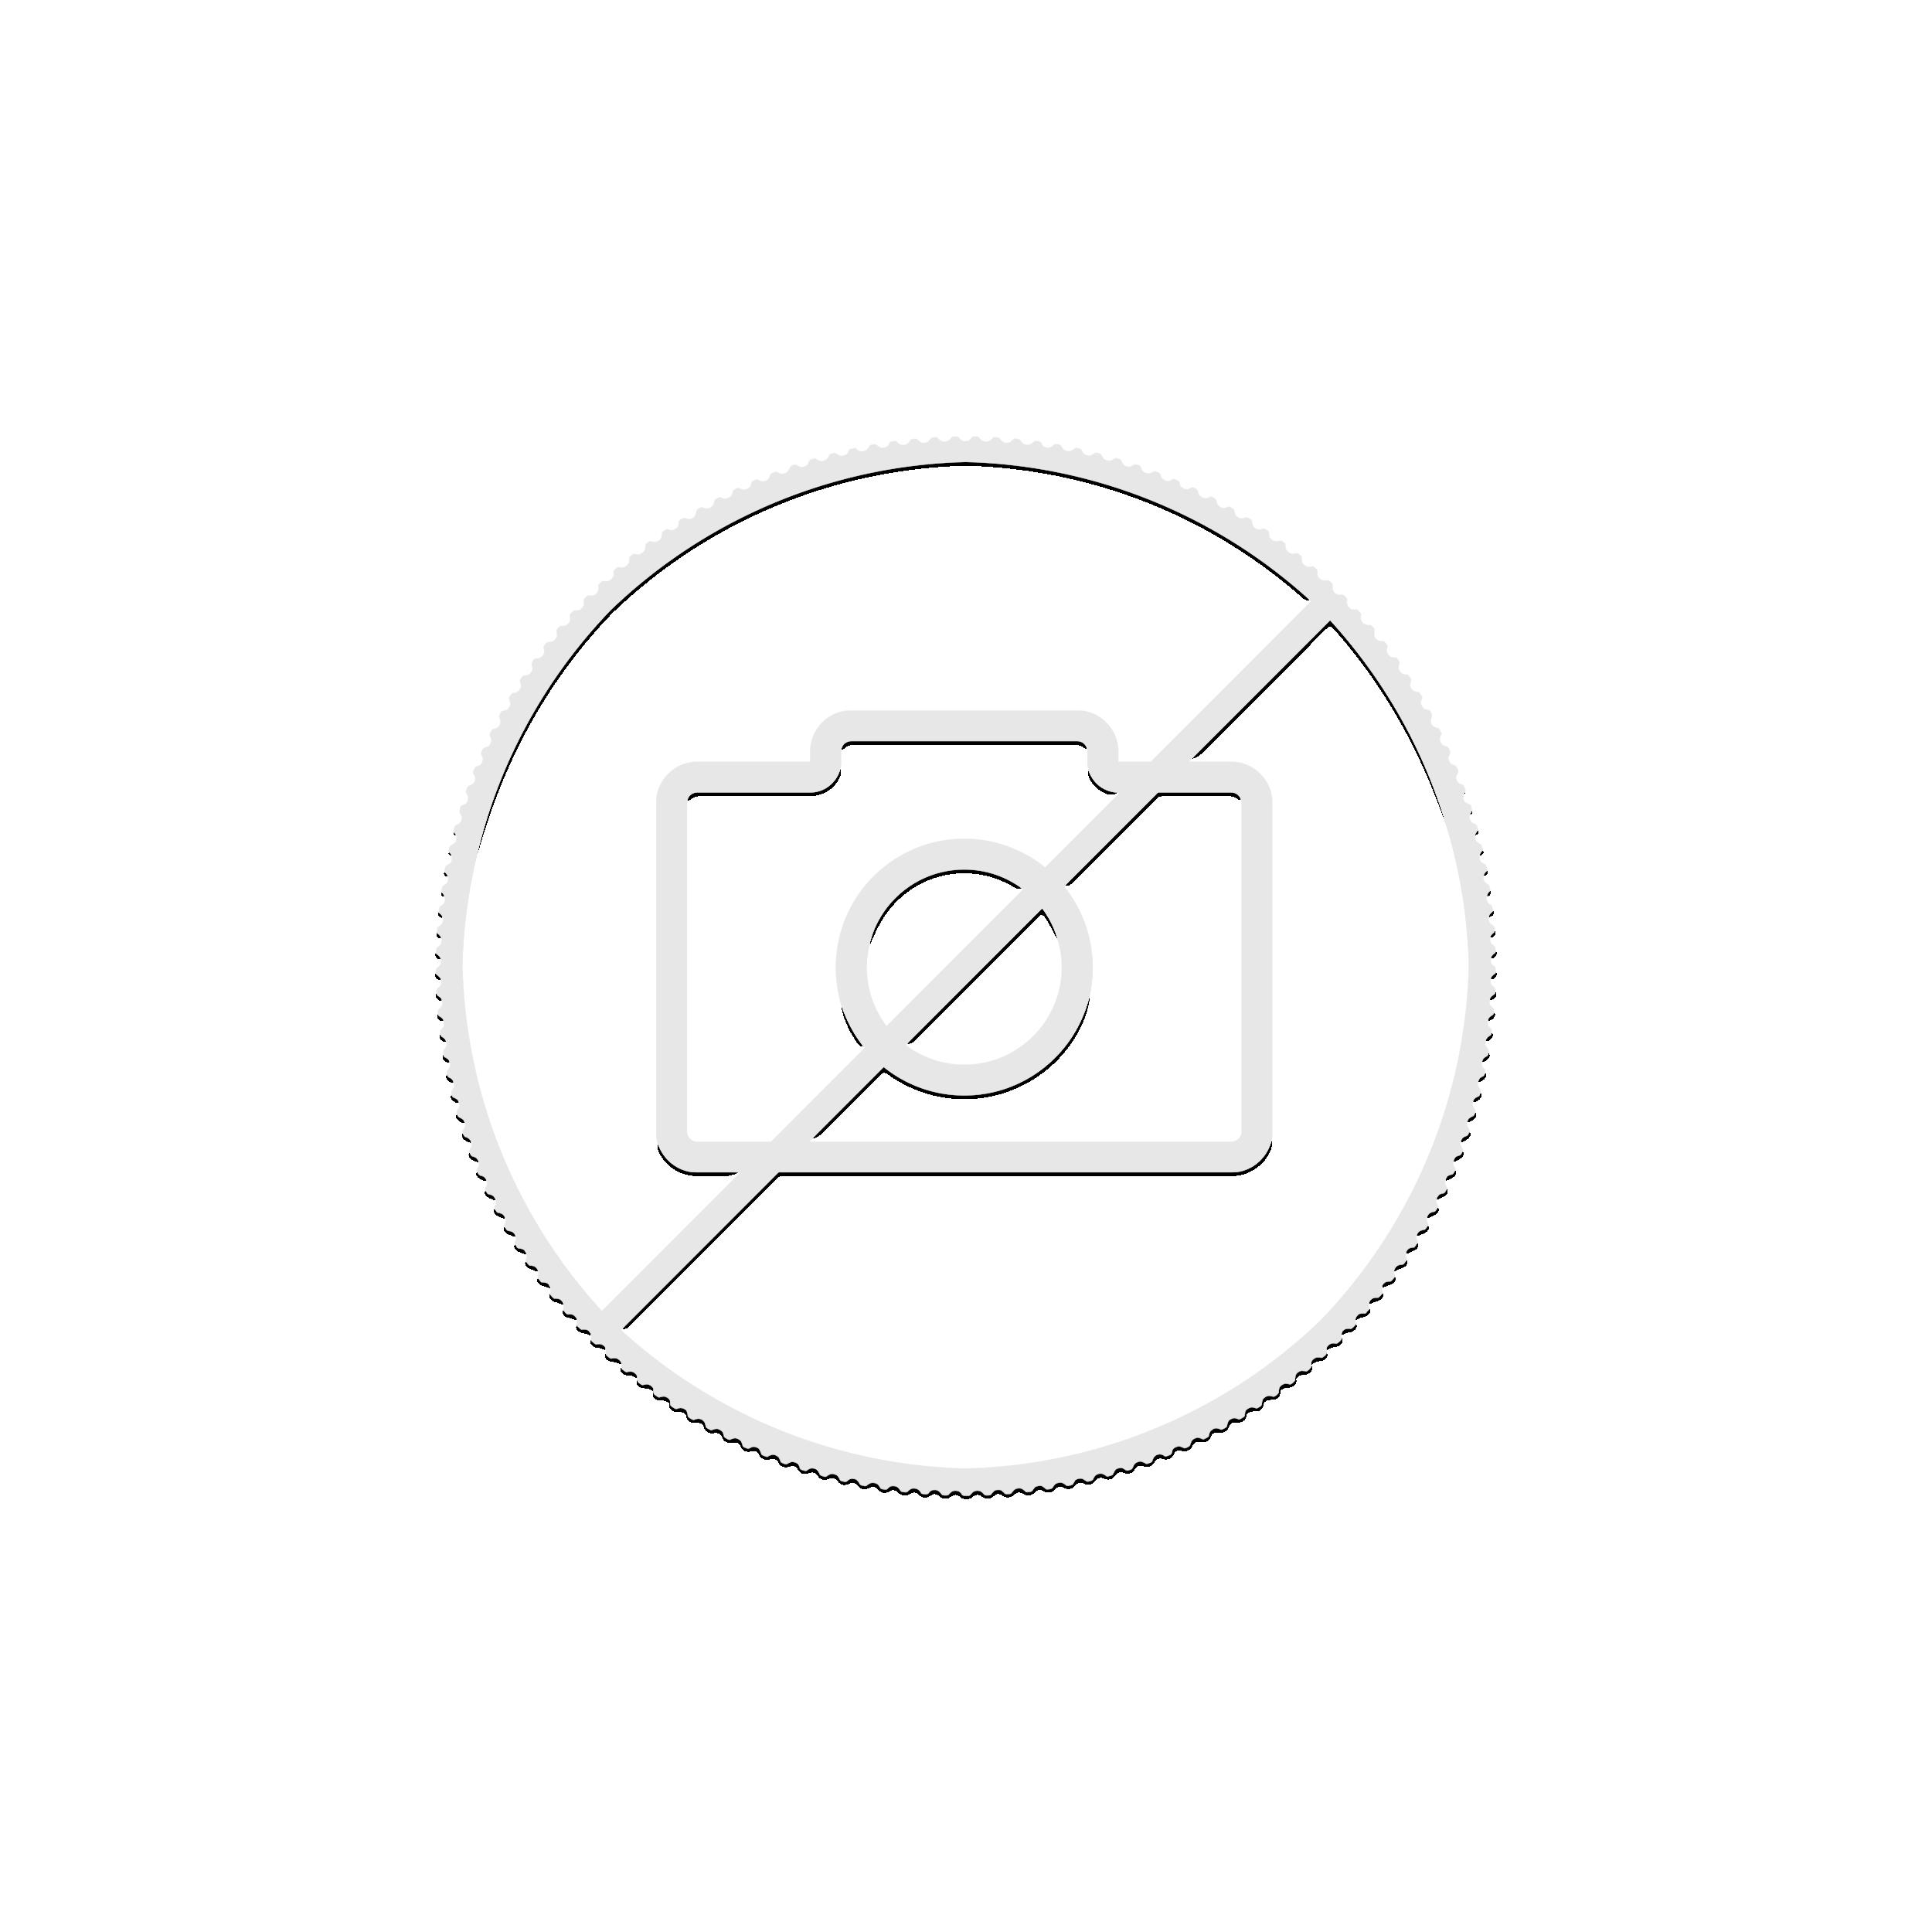 Duitse Marken collectie